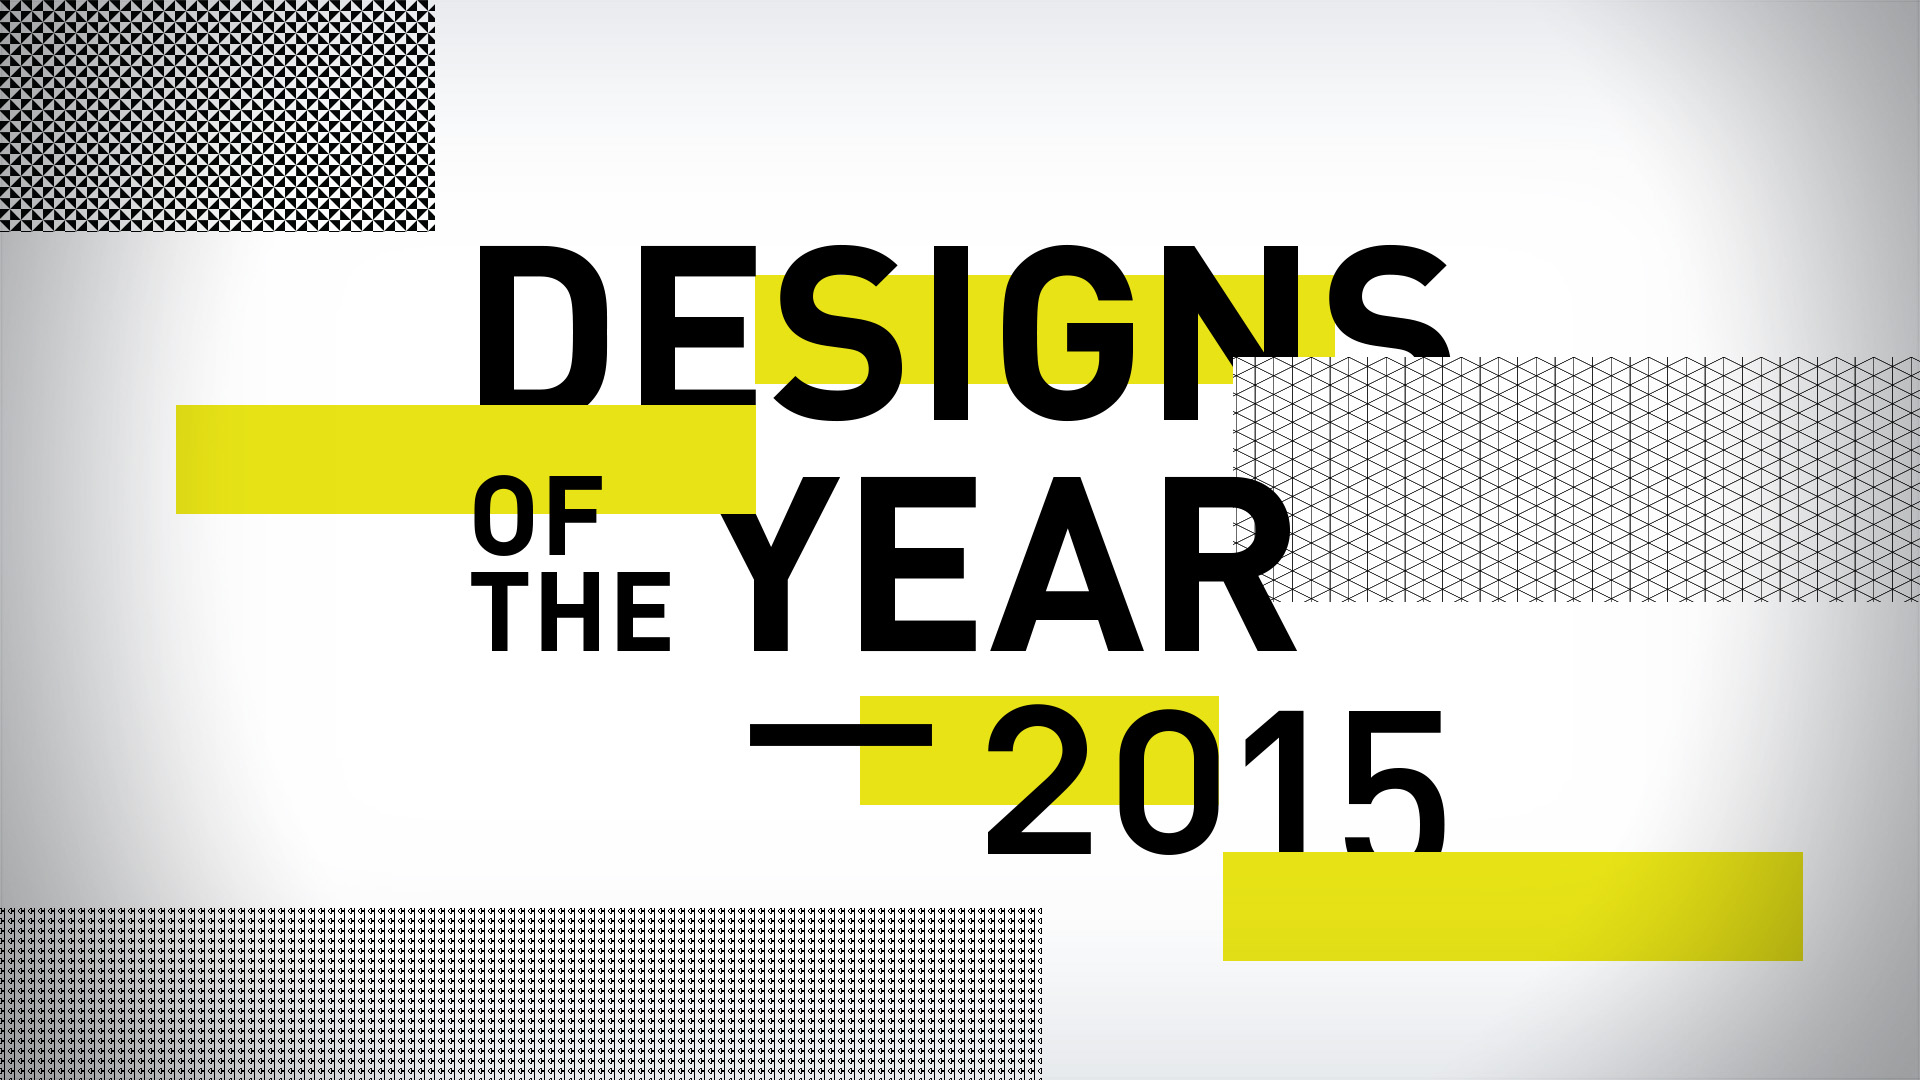 Design Museum - 2-27 copy